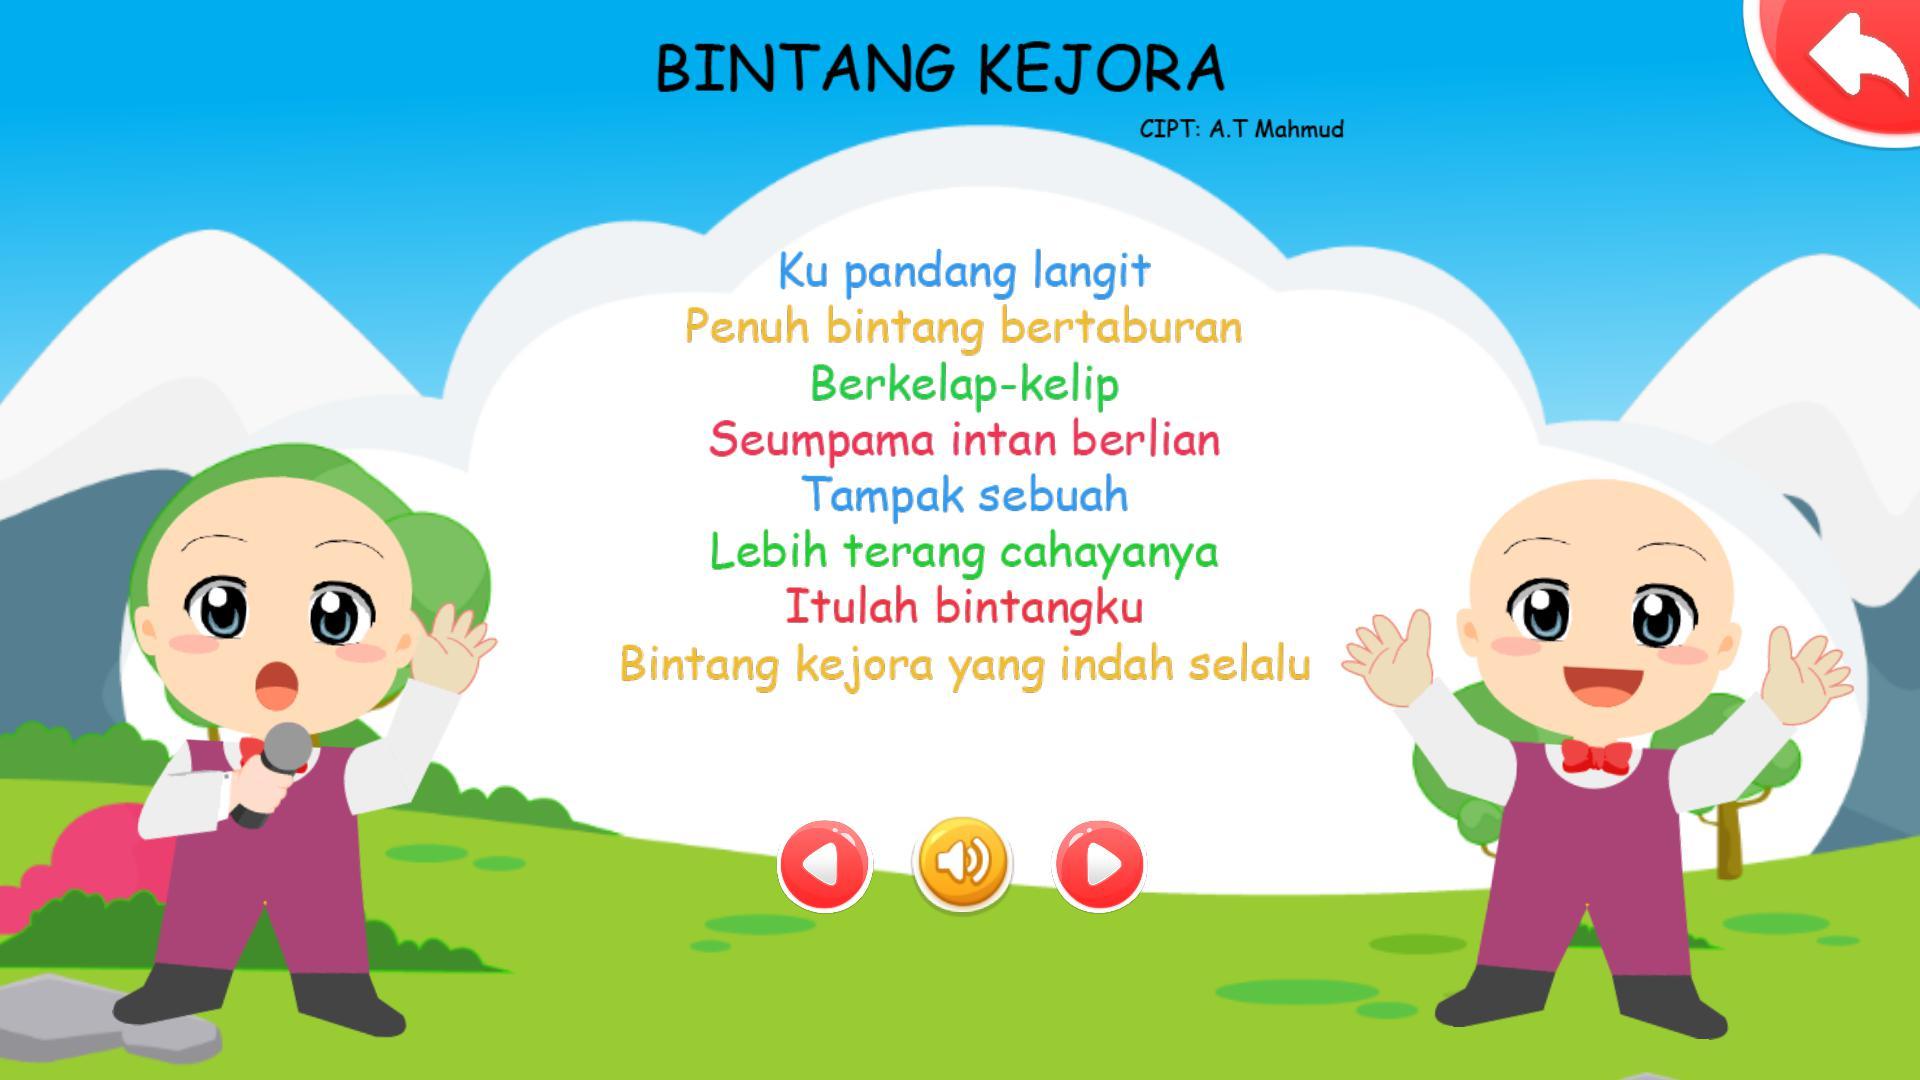 Menyanyi Lagu Anak Bersama 2 游戏截图3